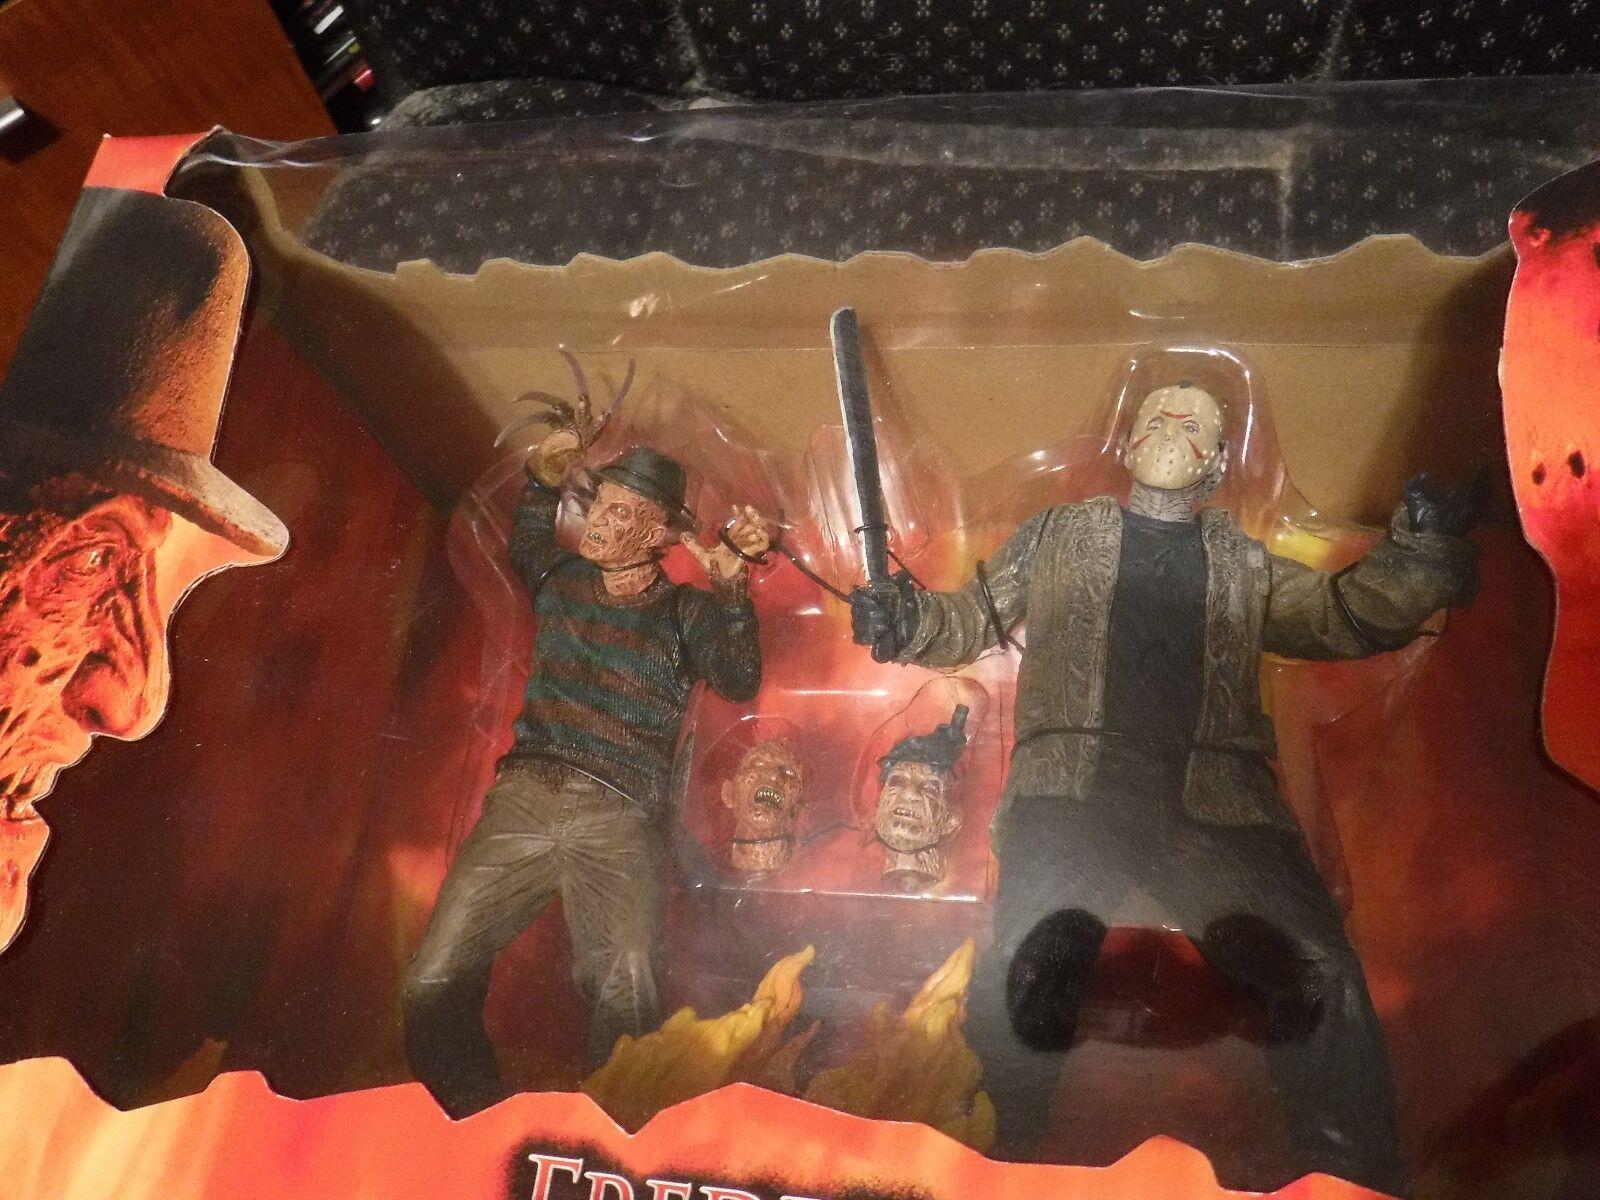 Neca Reel Toys Frossody Vs Jason Diorama Box Set Friday 13th Nightmare Elm St NIB